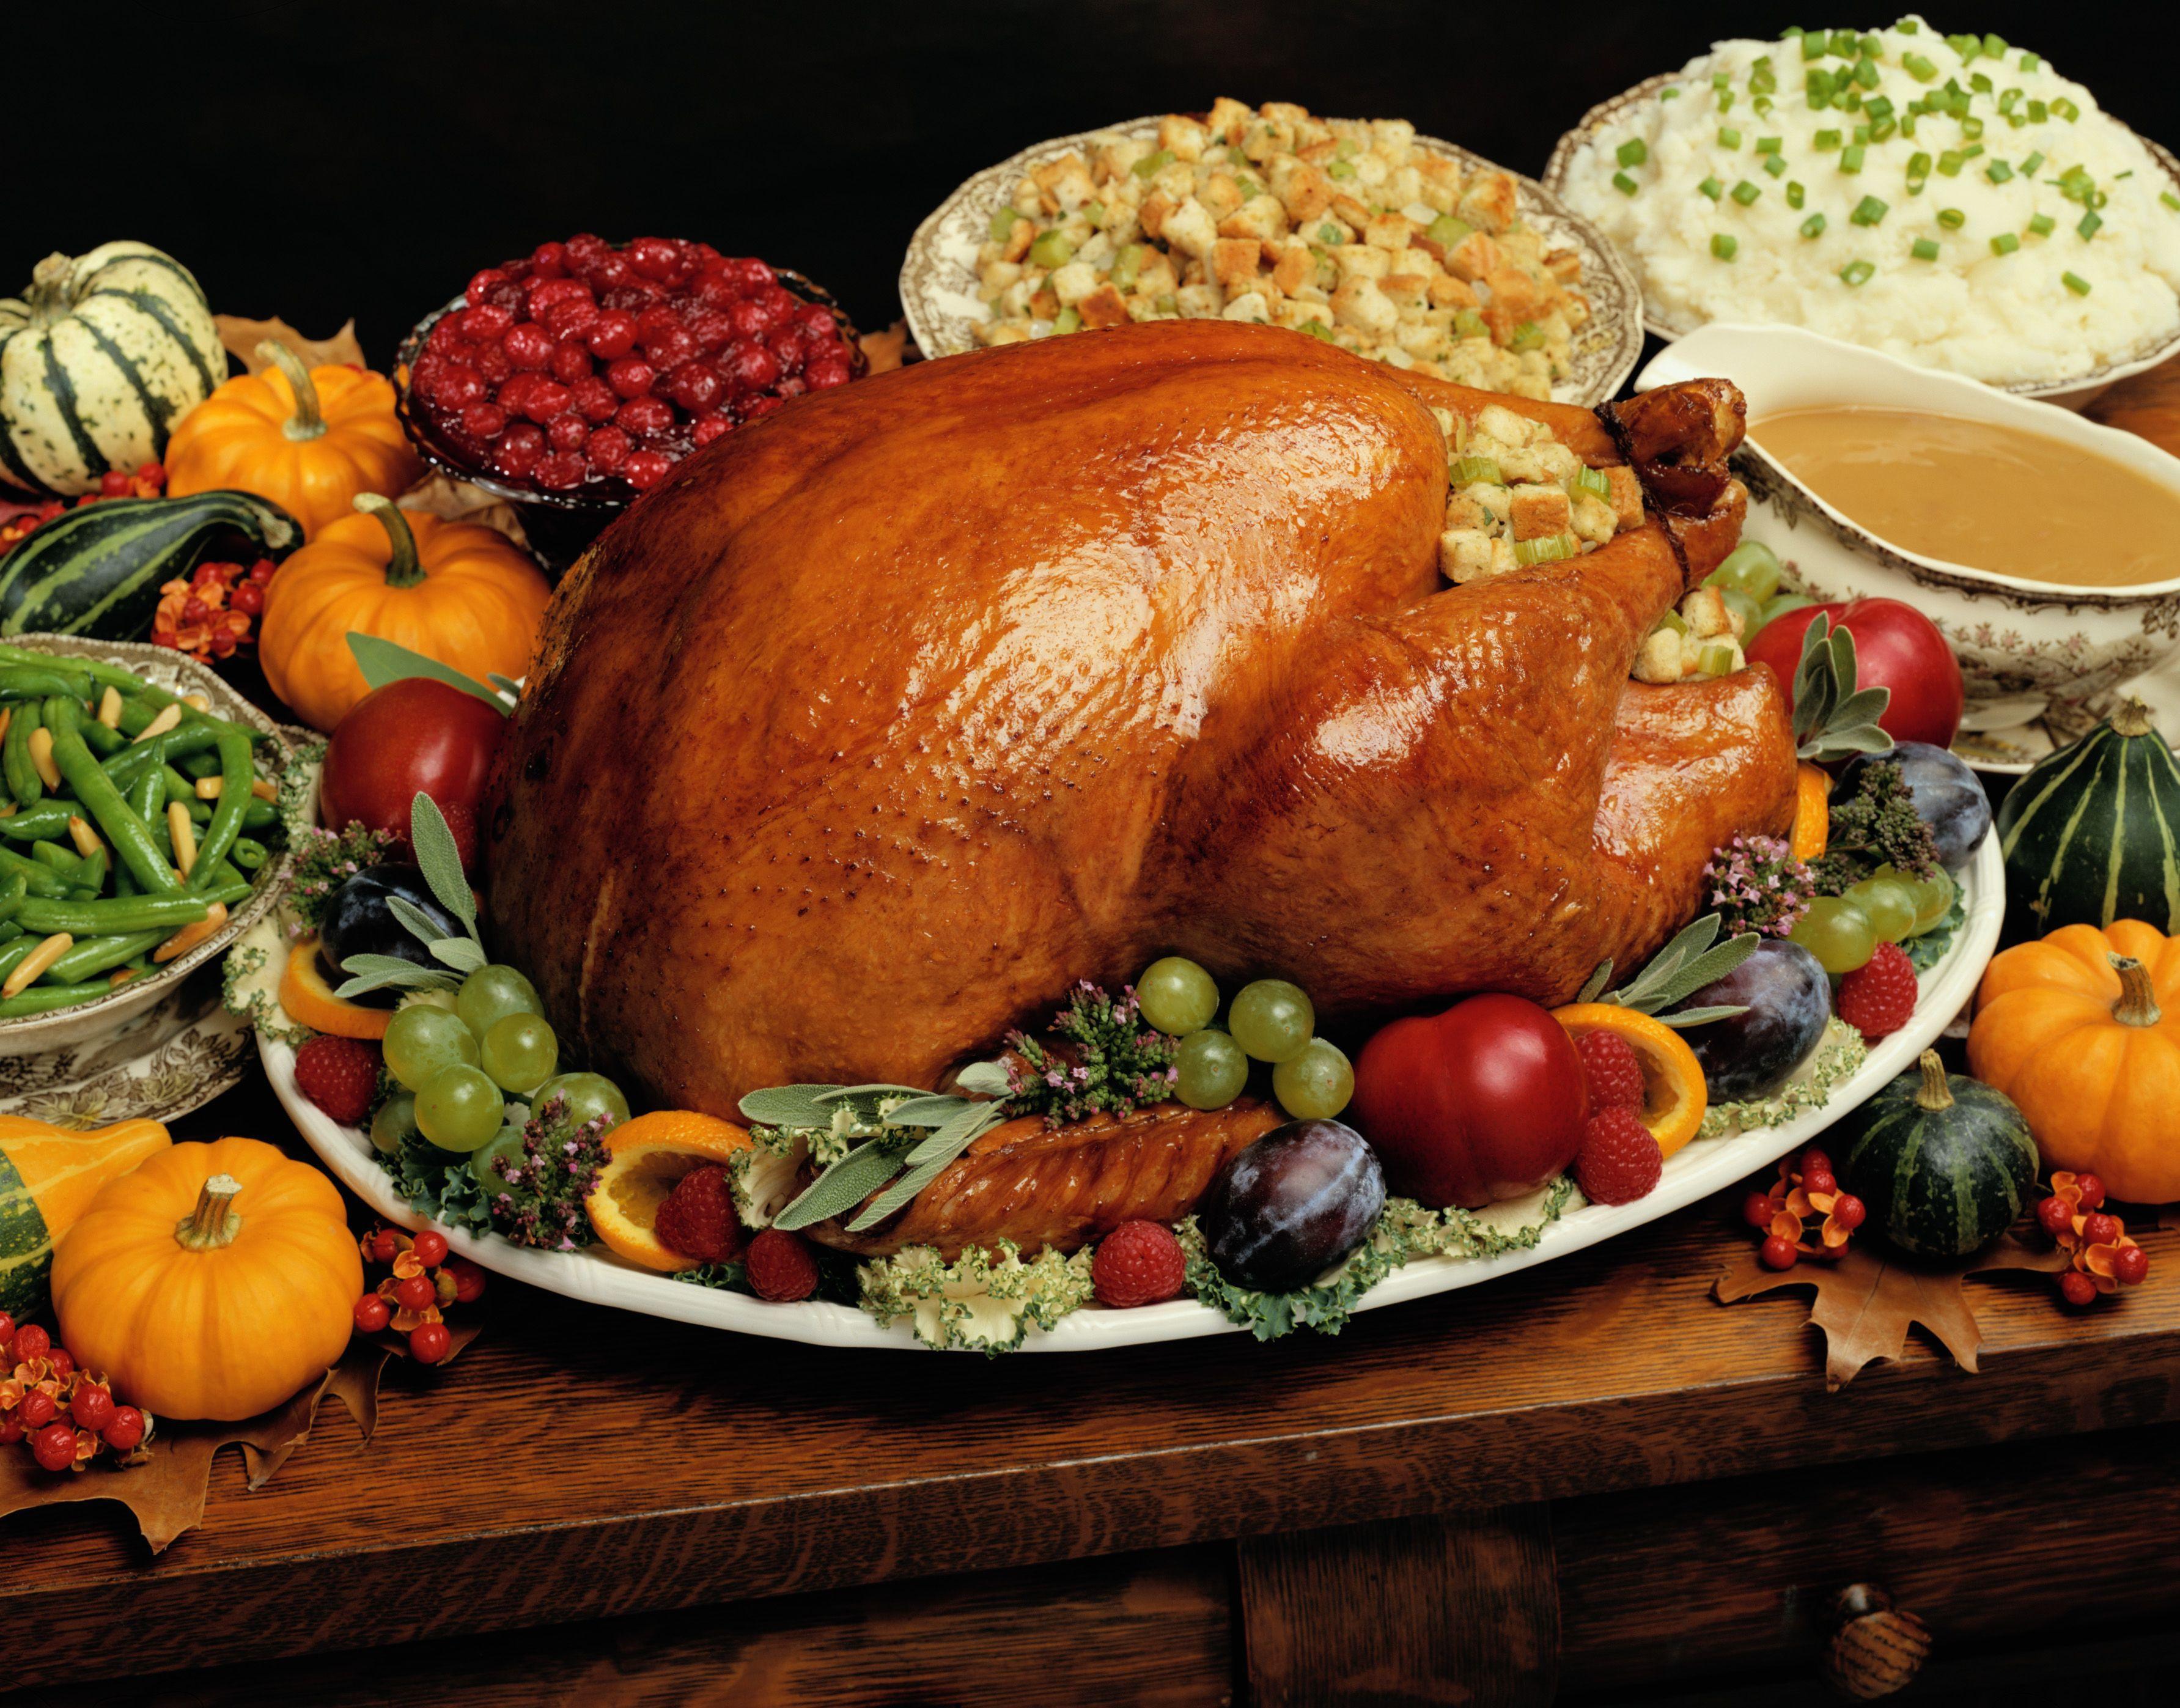 Thanksgiving Dinner In Dc  Thanksgiving Dinner at Restaurants in Washington D C